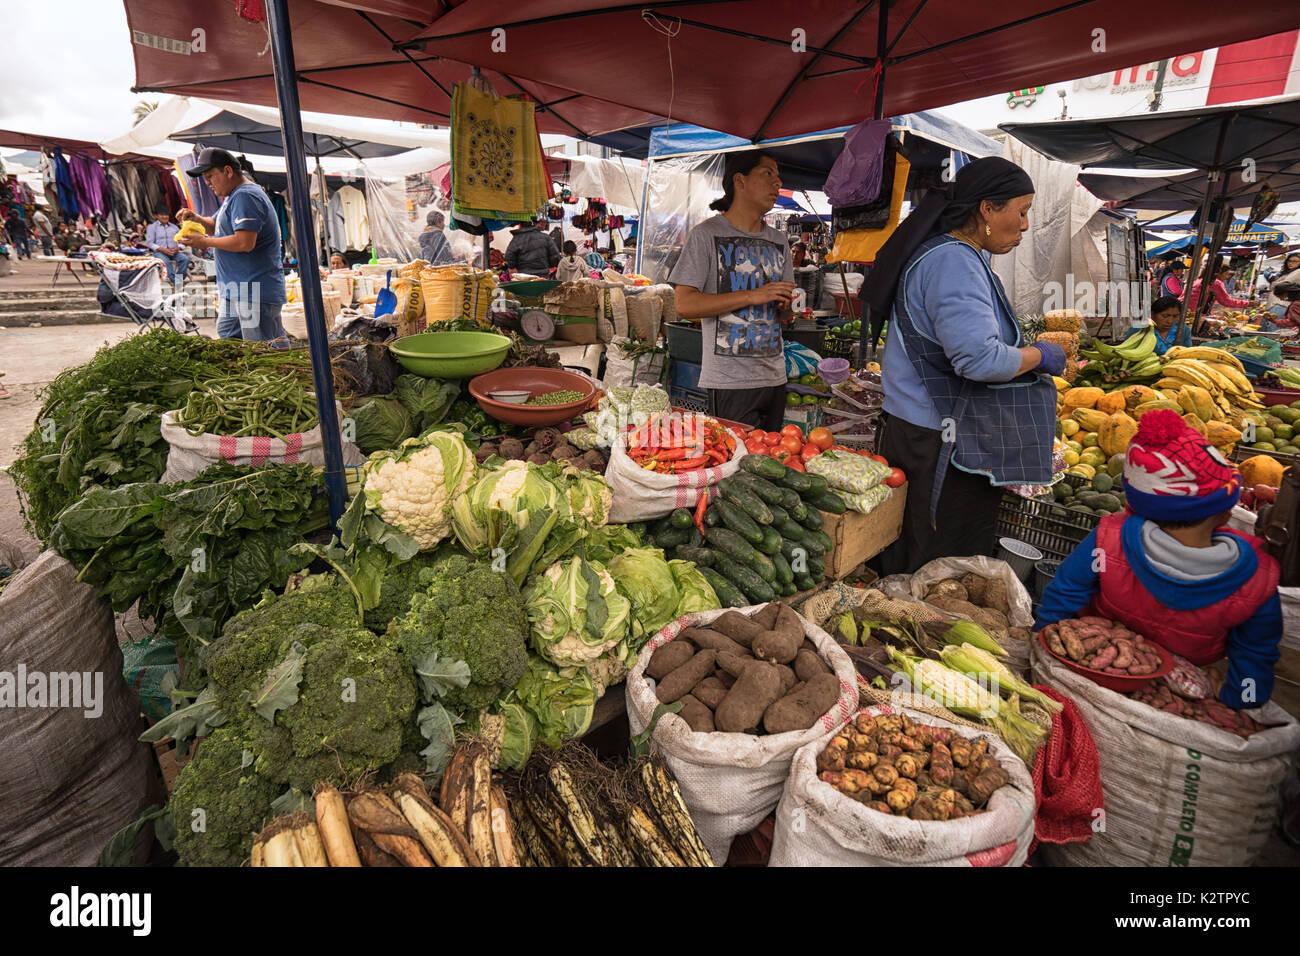 Mai 6, 2017 Otavalo, Ecuador: produzieren Anbieter auf dem Markt am Samstag Stockbild